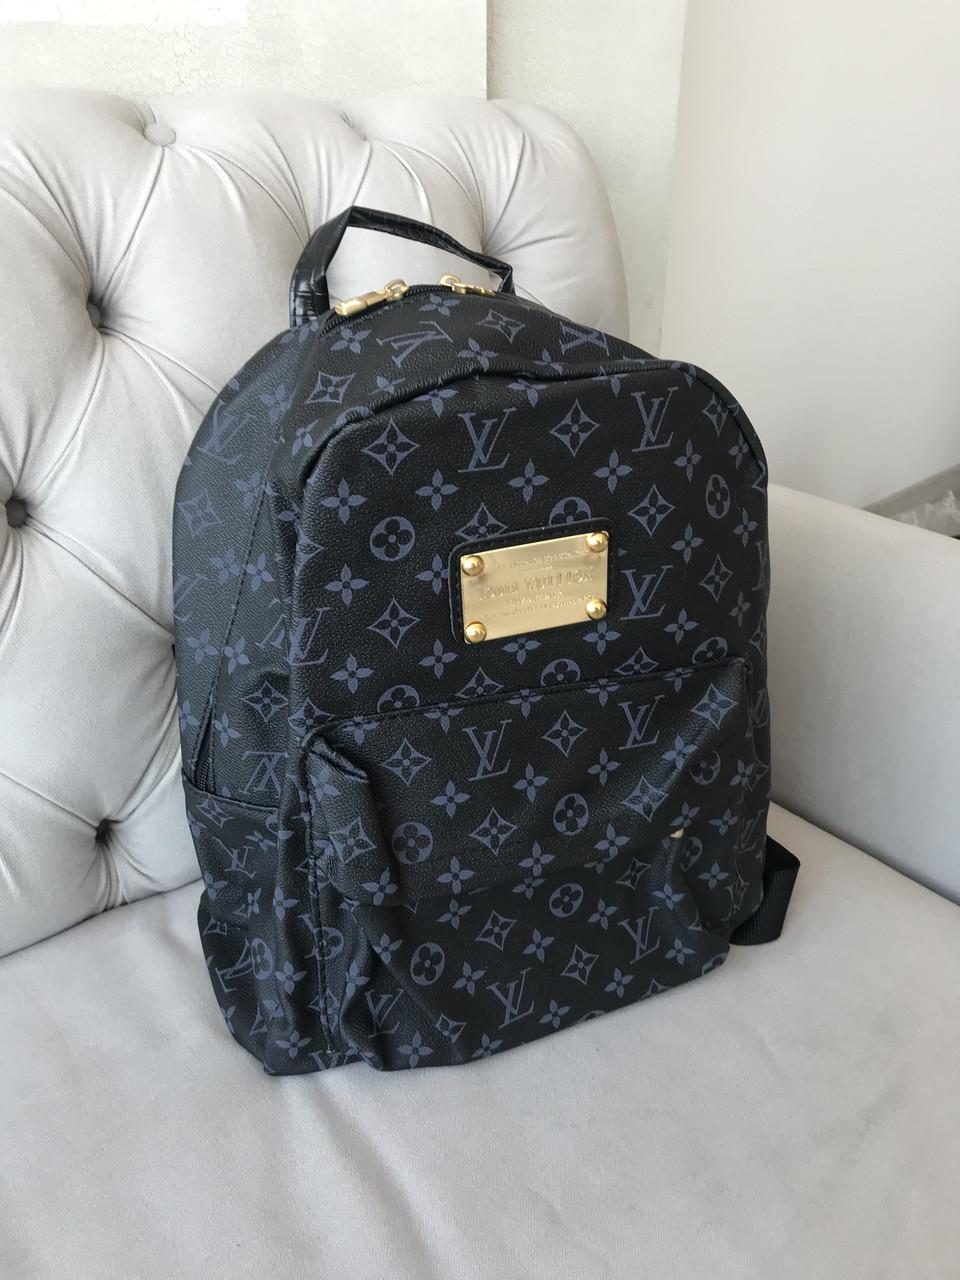 Рюкзак портфель ранец  Louis Vuitton  (реплика Луи Витон) Vintage Black